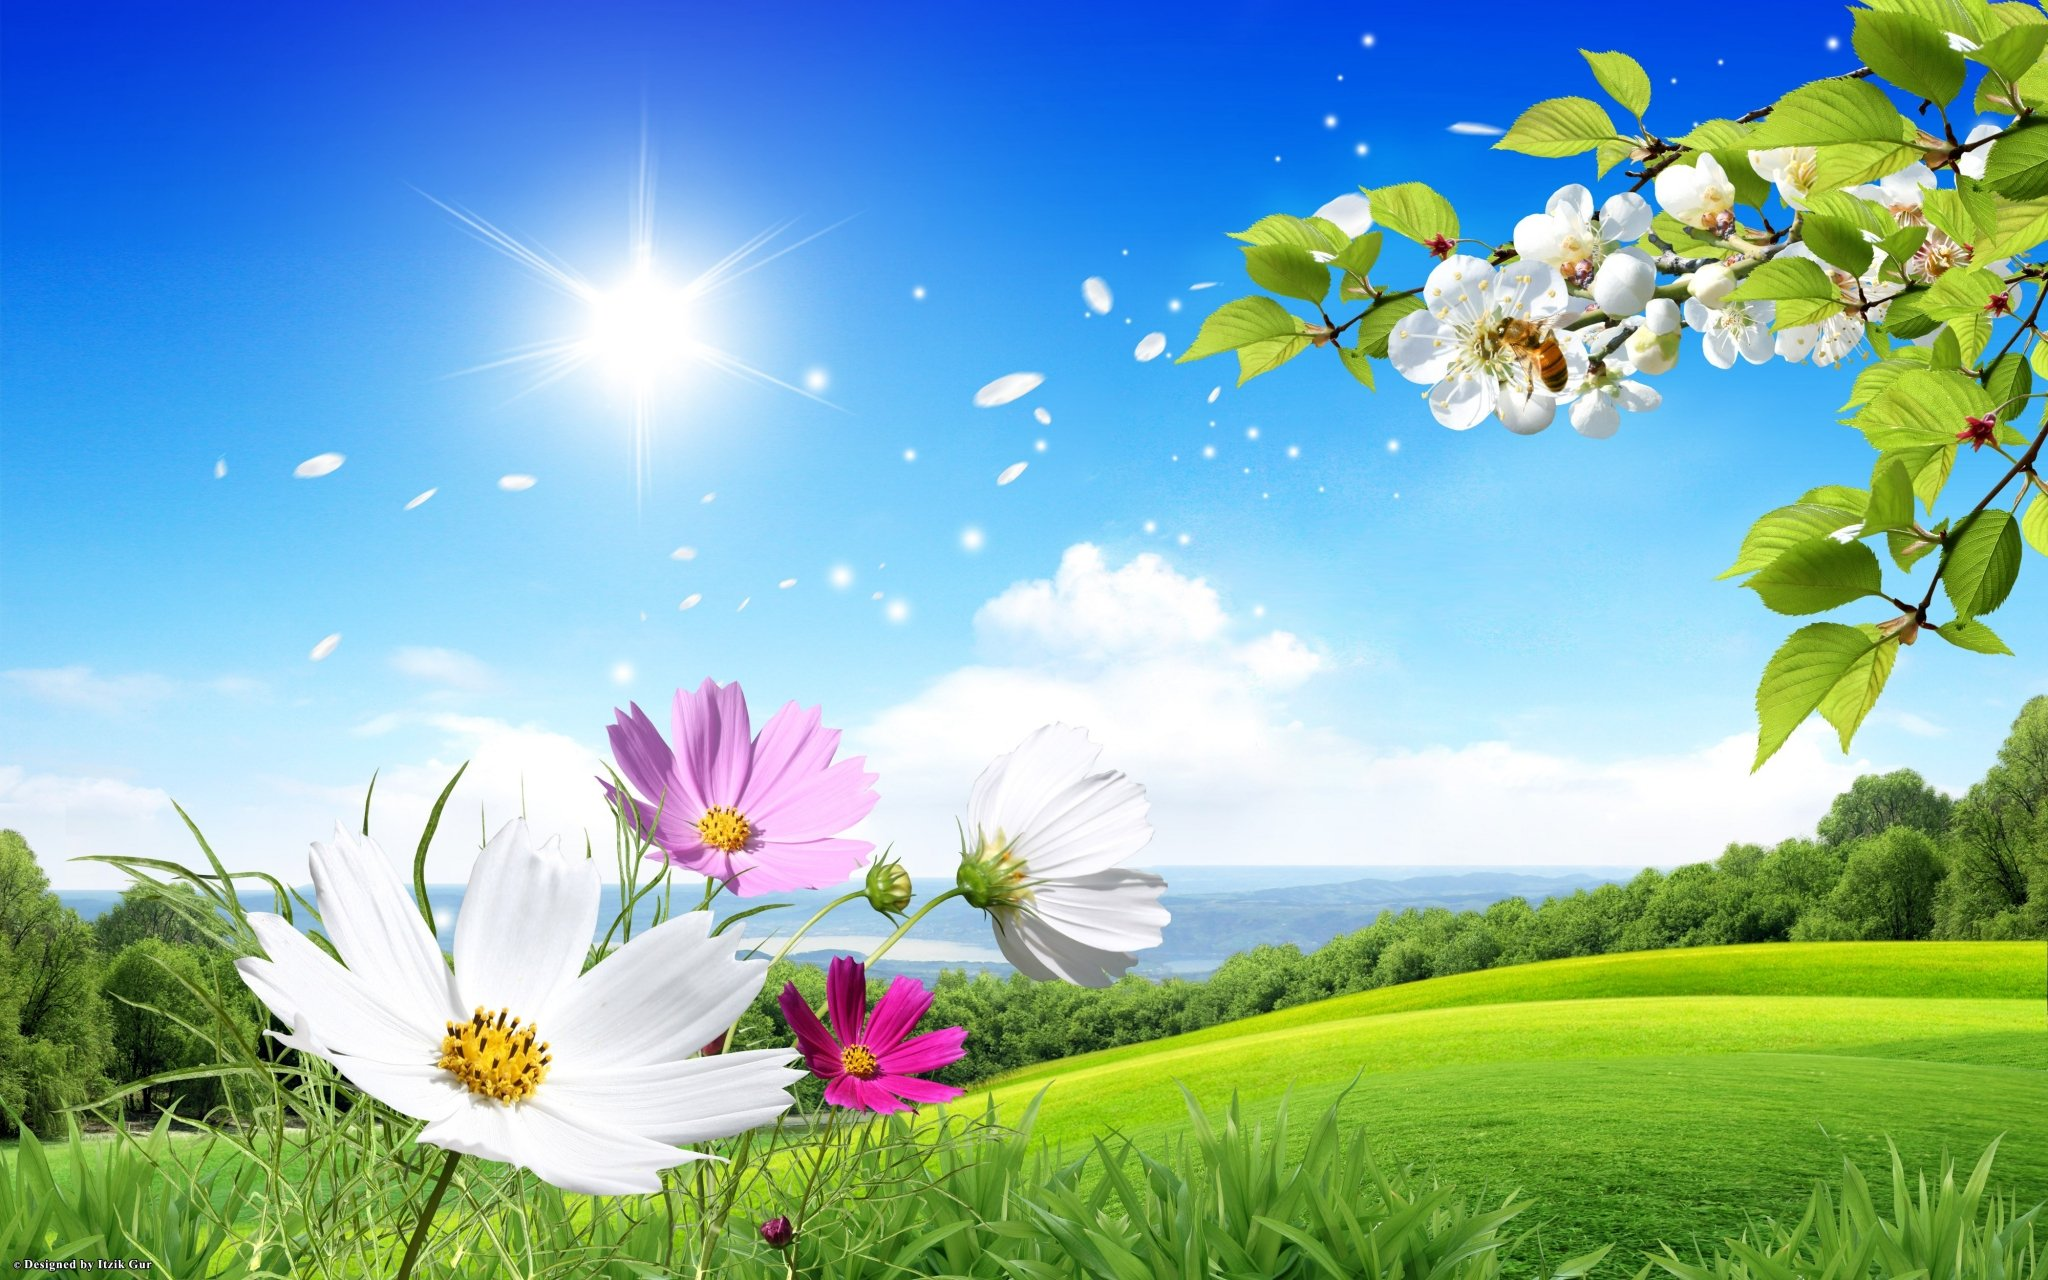 Spring Background   Picseriocom 2048x1280